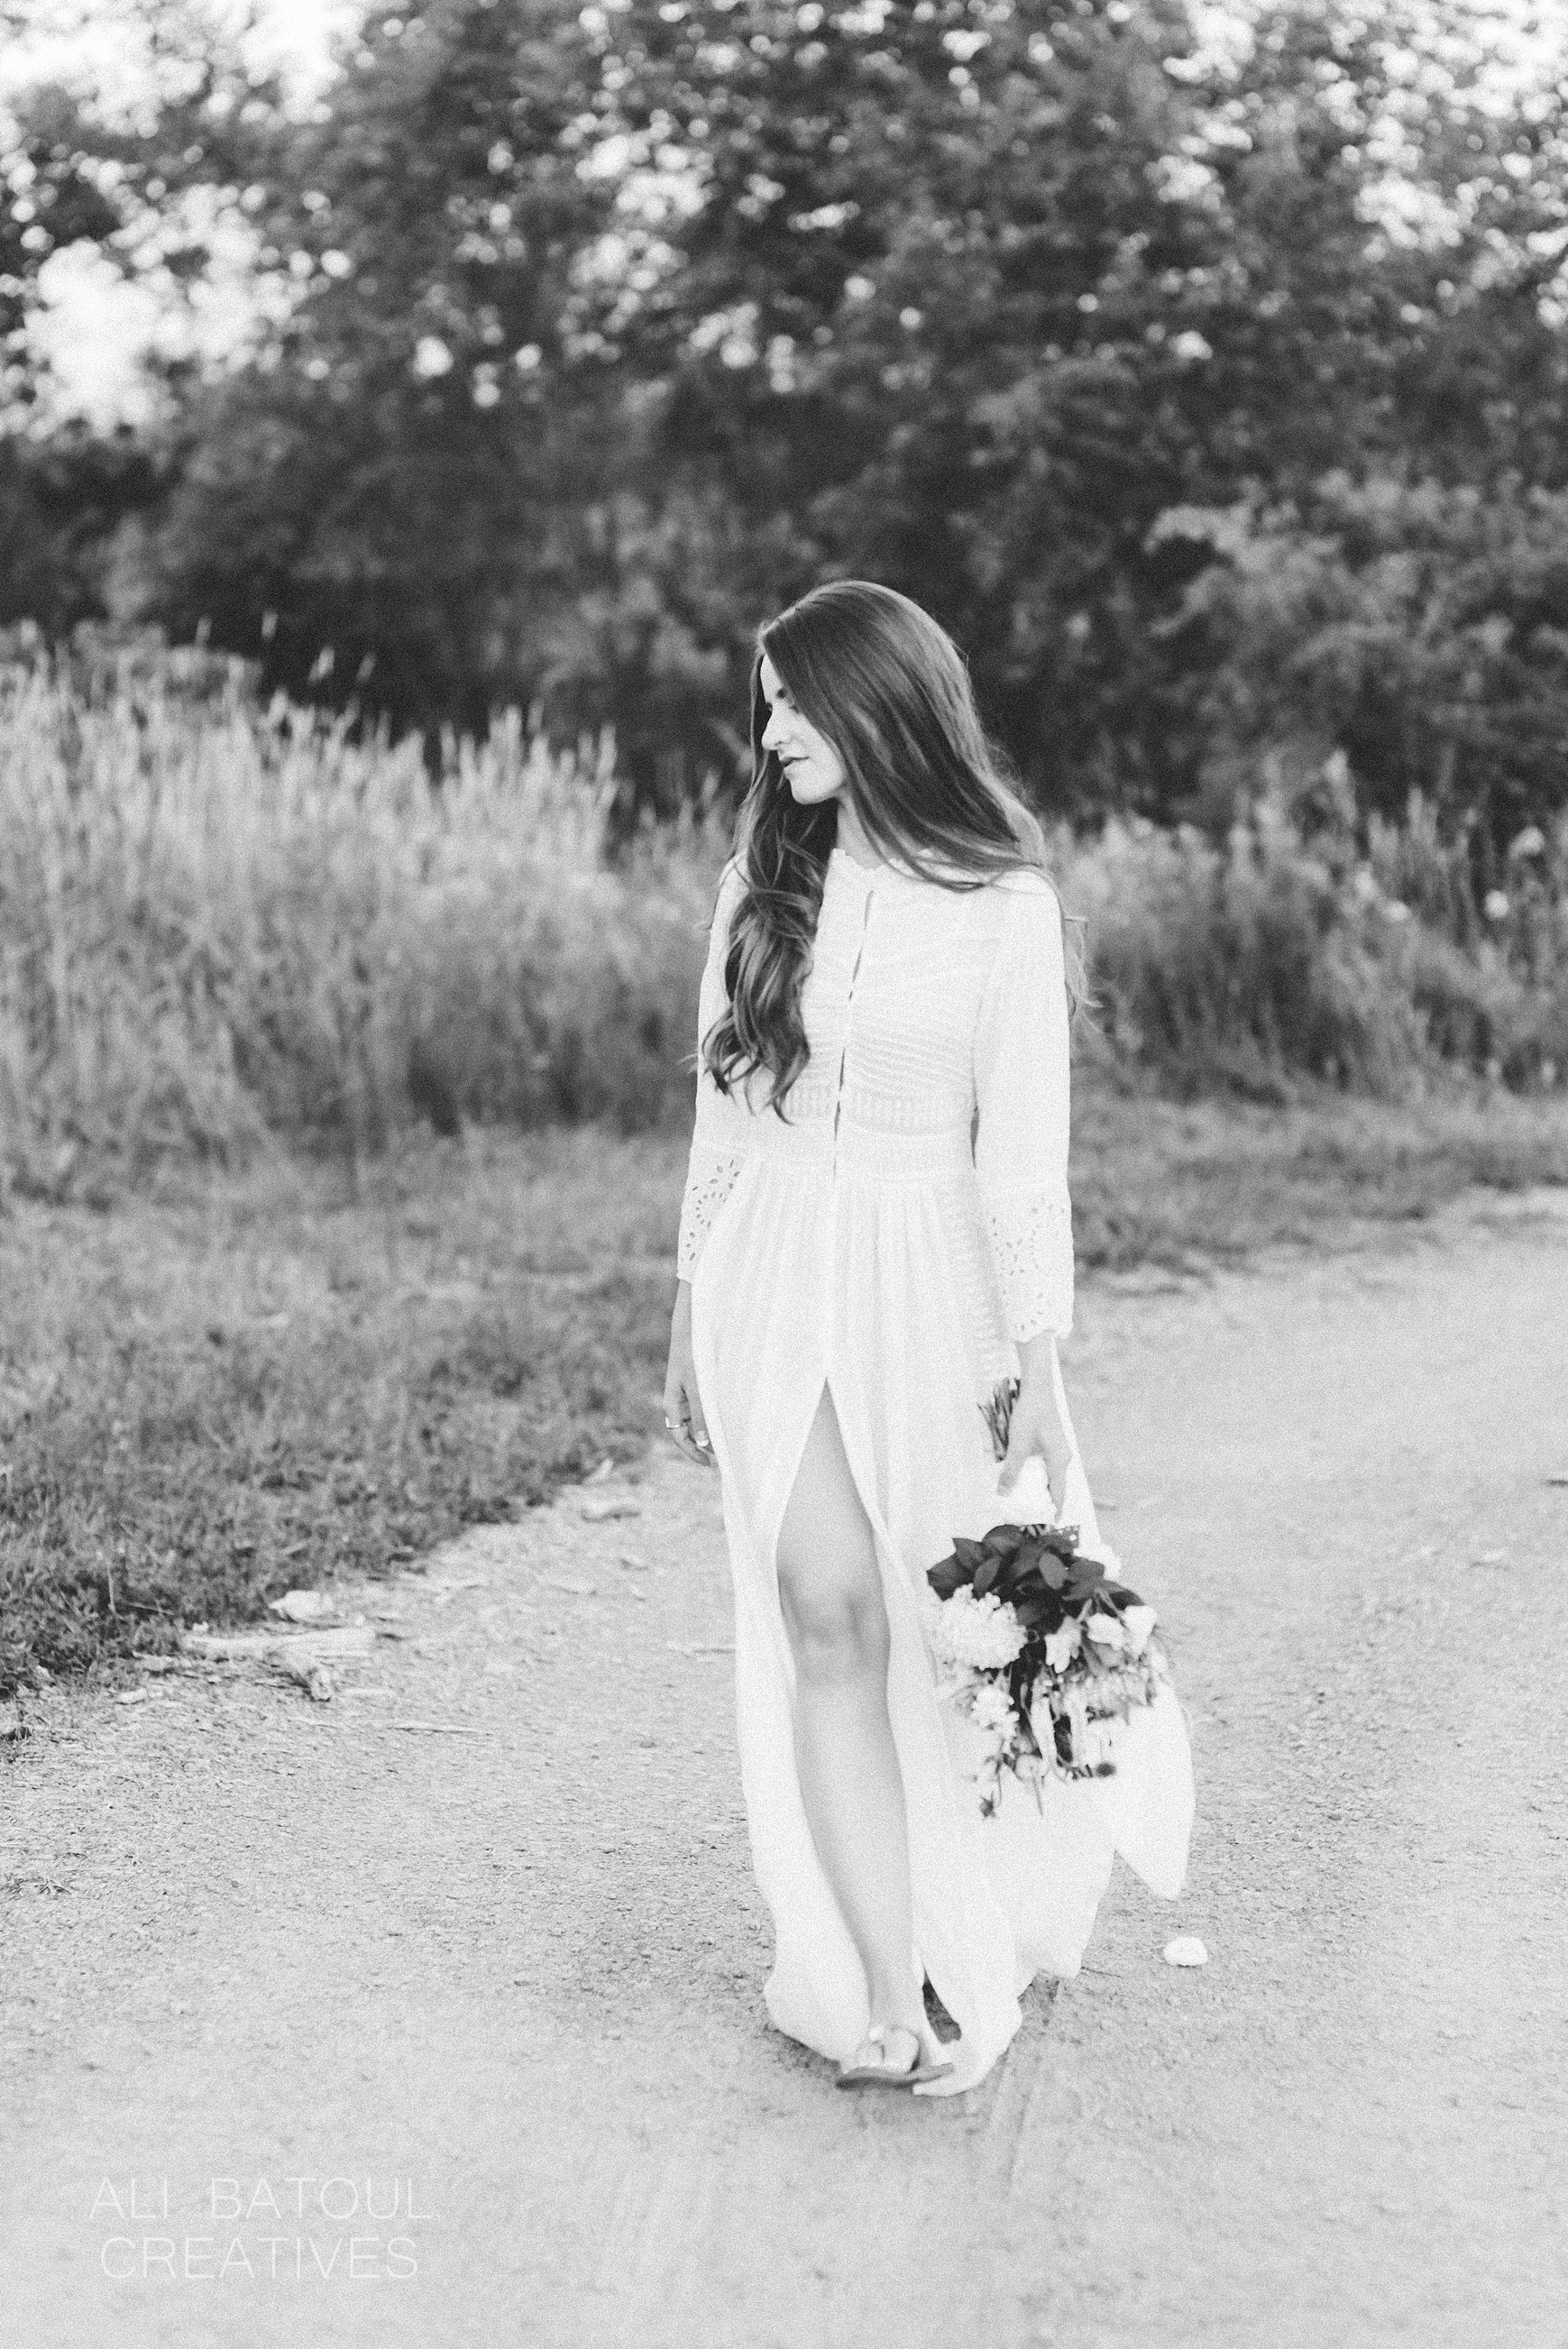 Boho Bridal Ottawa - Ali Batoul Creatives Fine Art Wedding Photography_0377.jpg